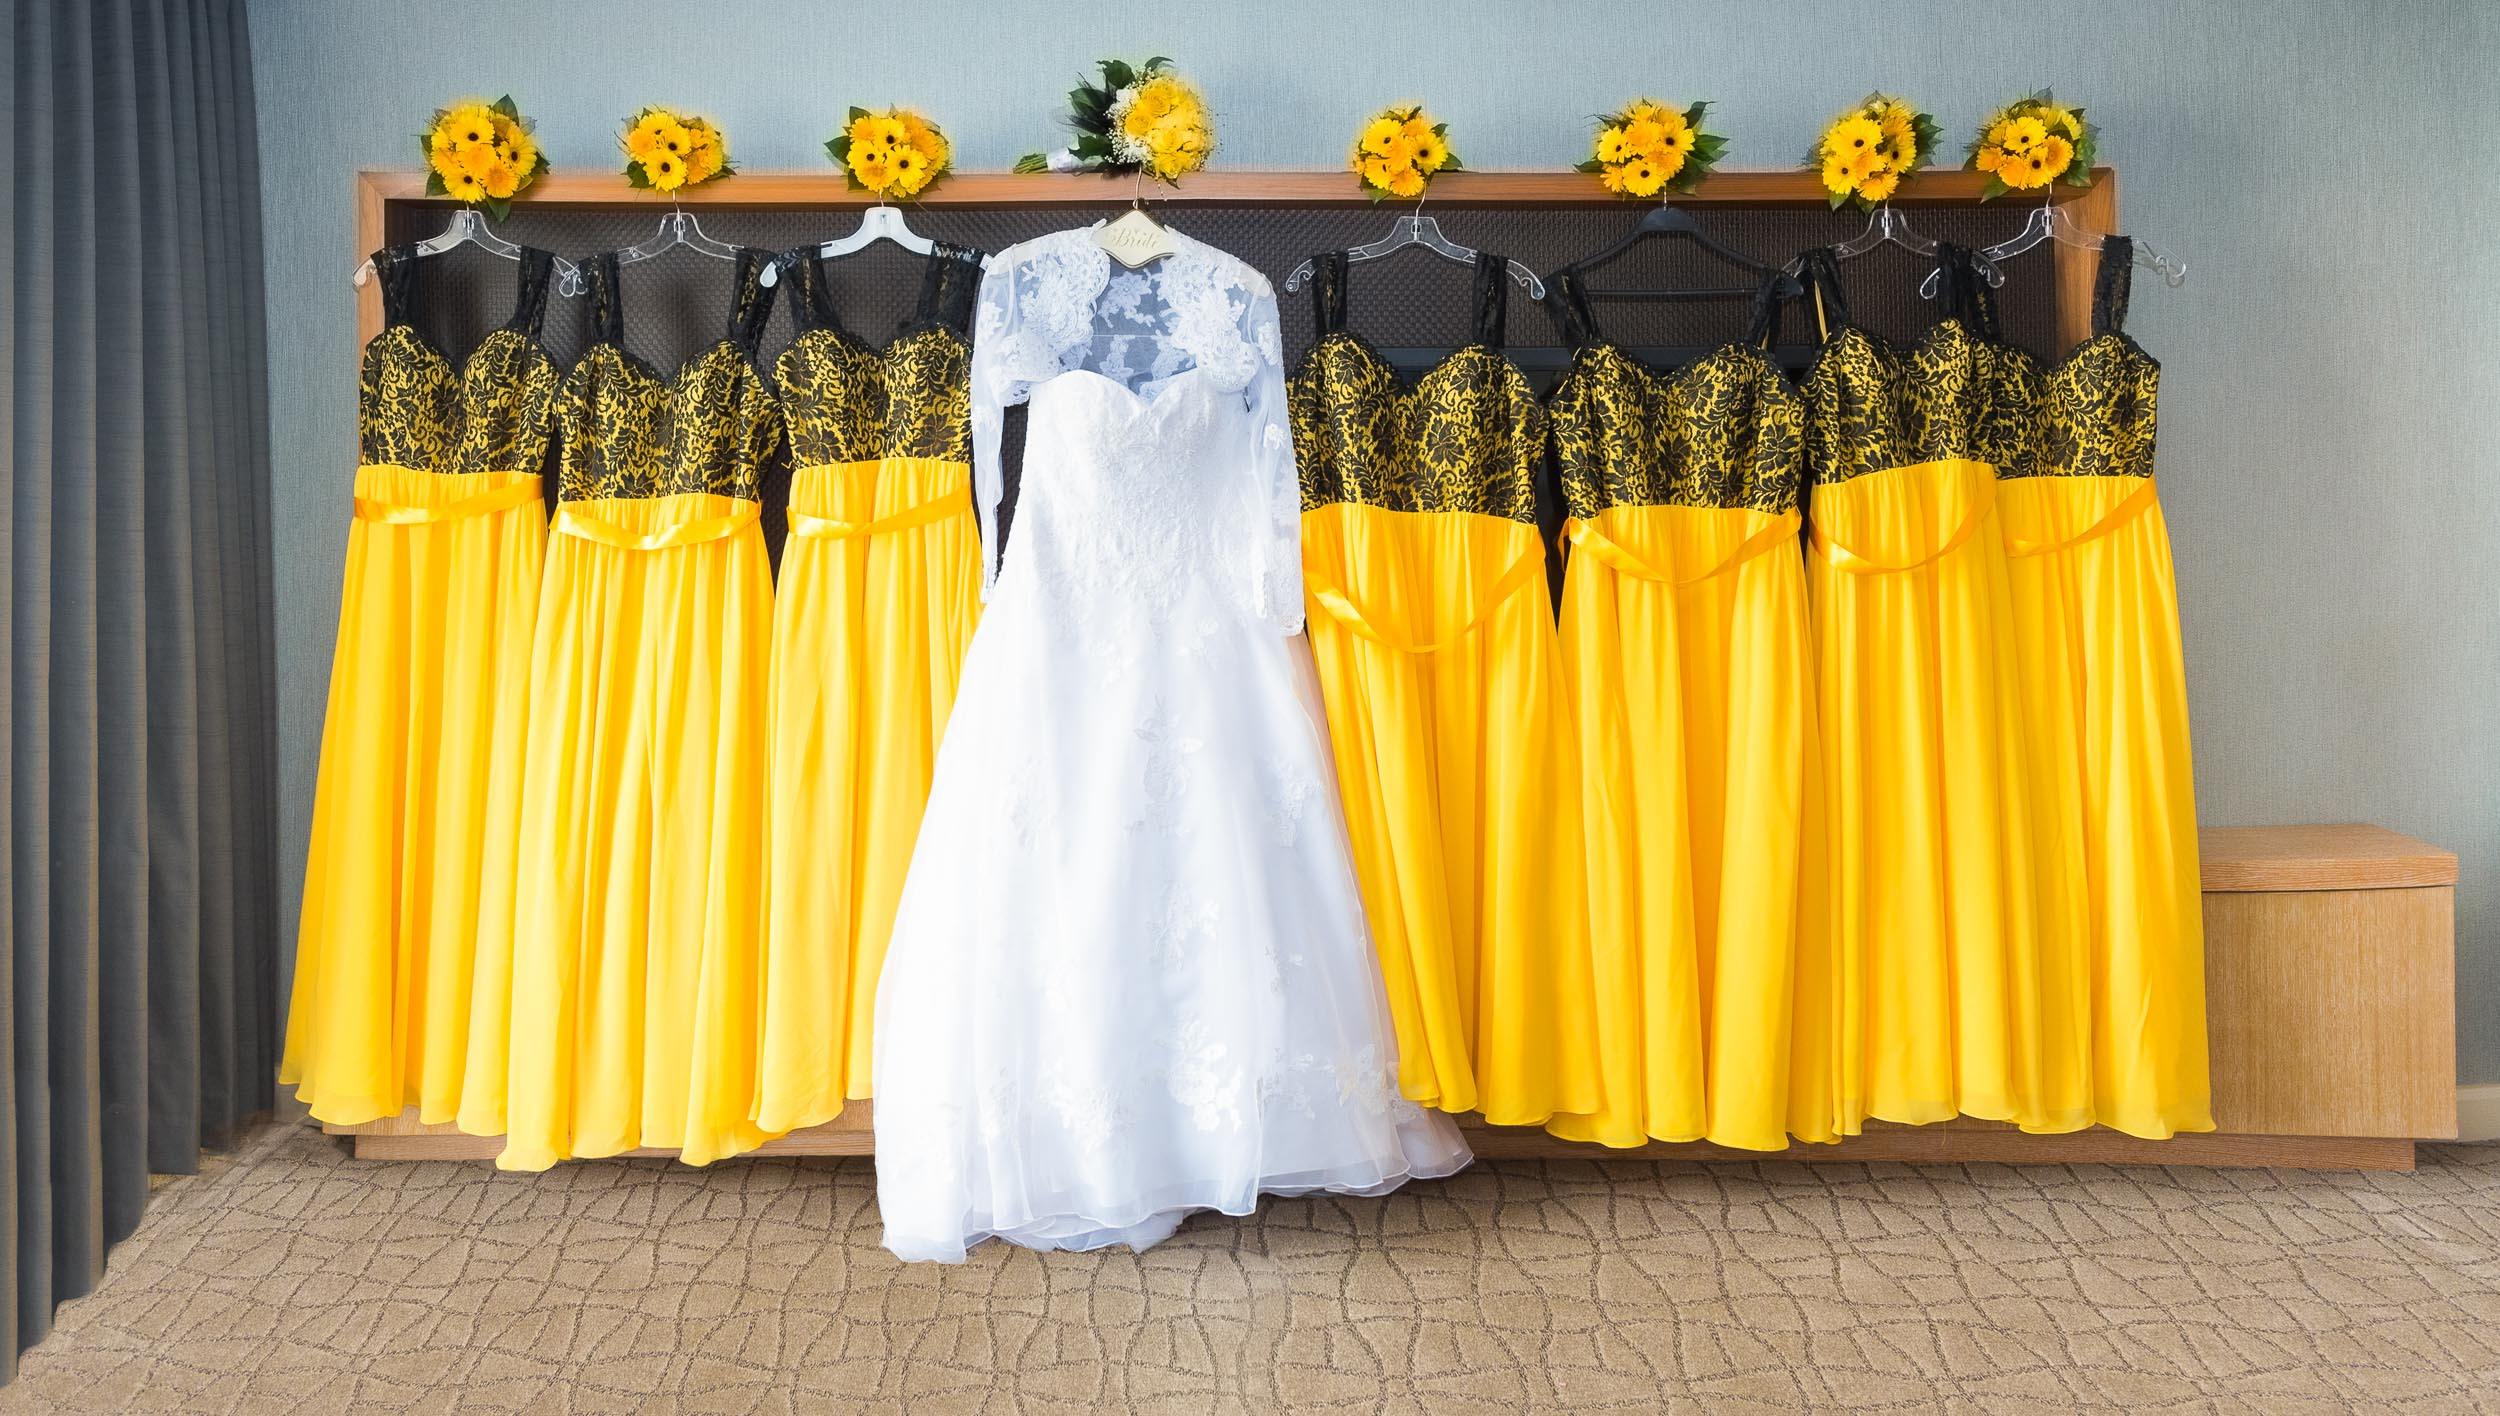 Bride-and-Bridesmaids-Dresses-1.jpg